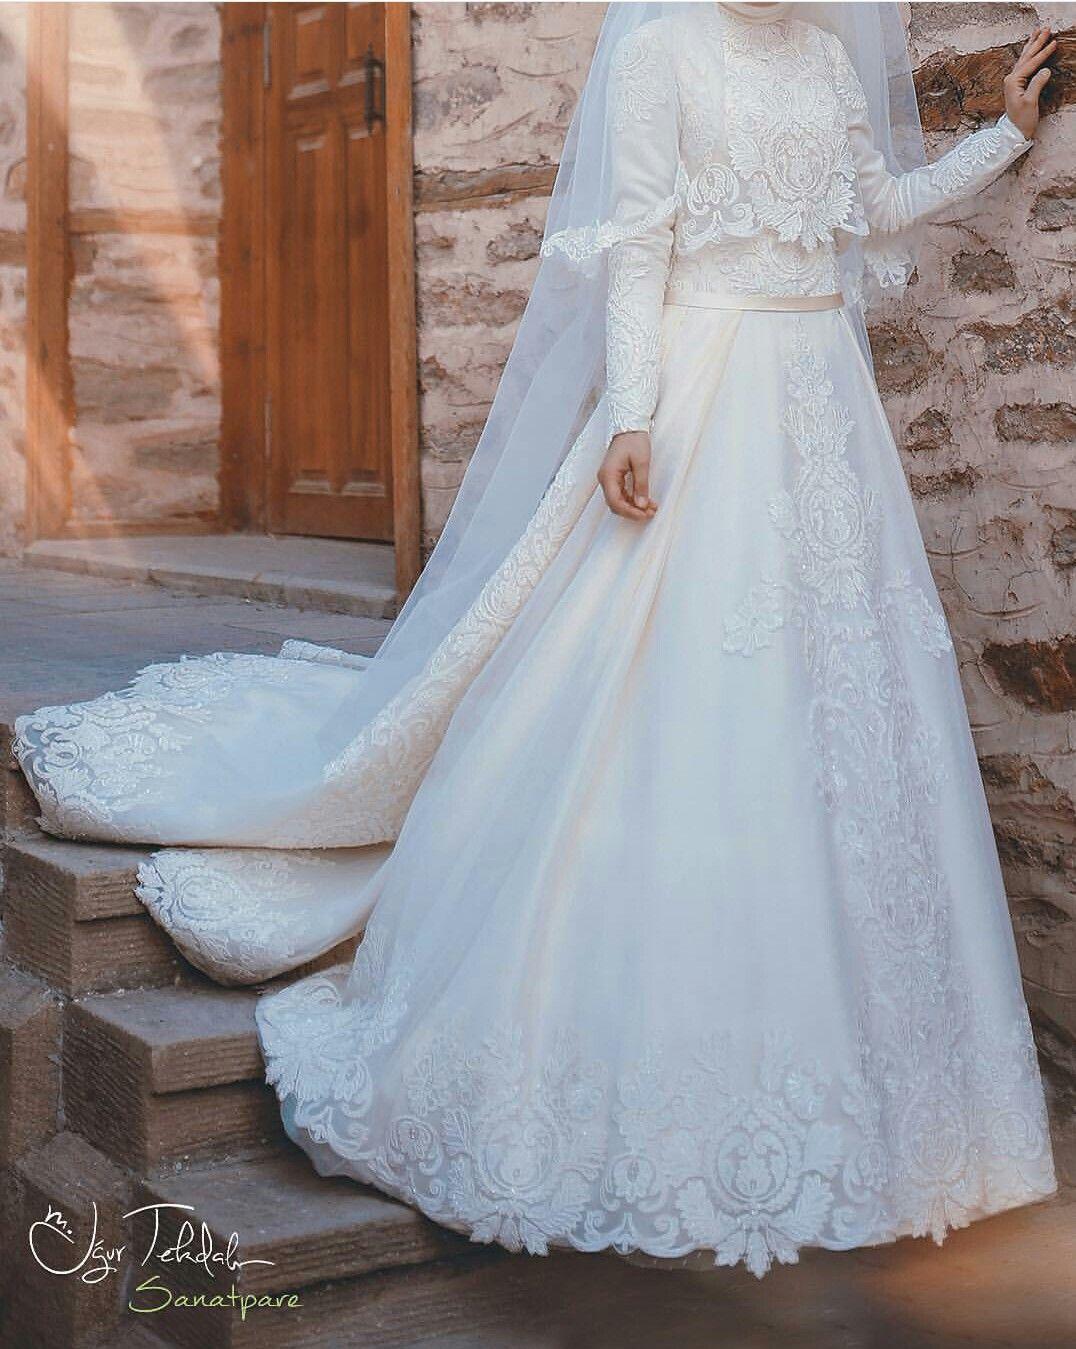 Gelinlik | 30 günlük bacak | Pinterest | Hijab bride and Saree